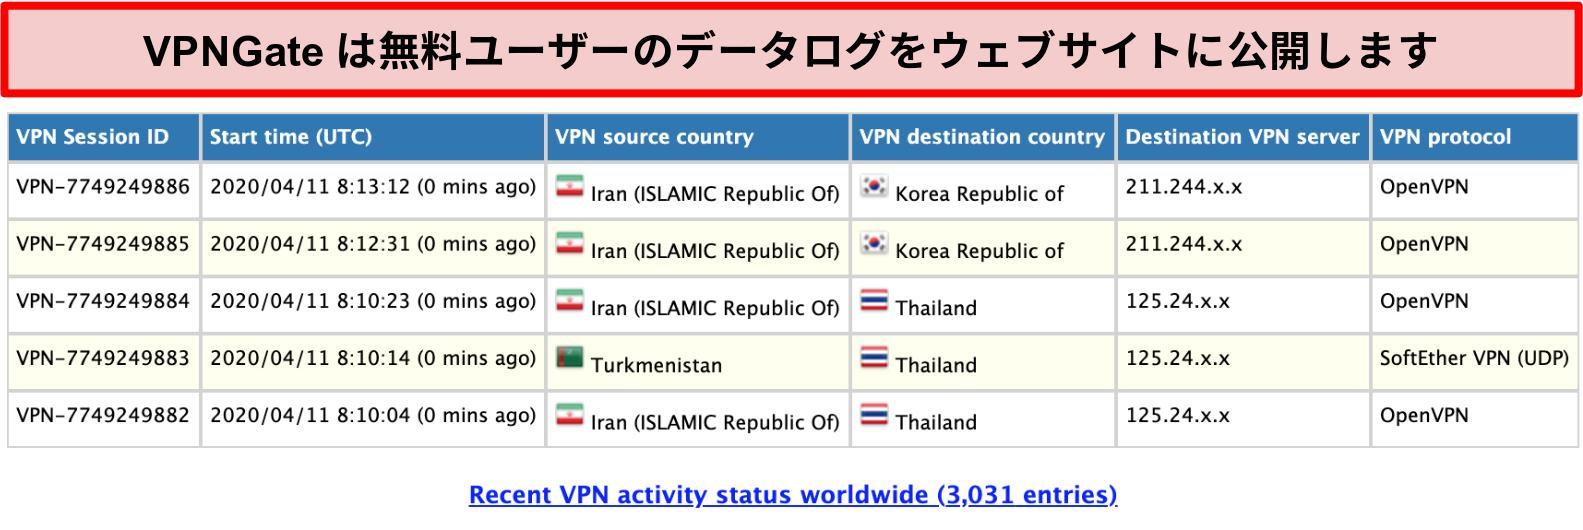 VPNGateのユーザーログのスクリーンショット